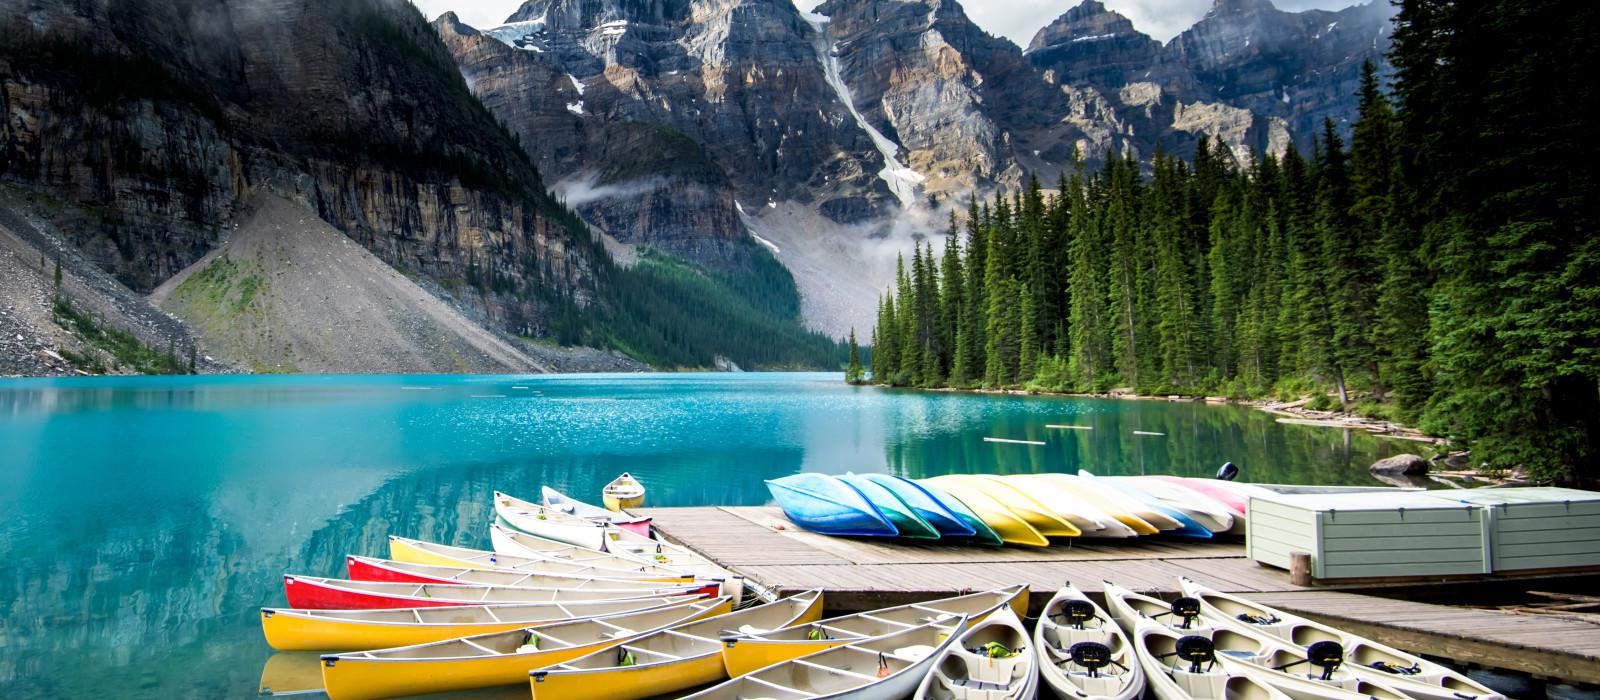 Reiseziel Banff Kanada